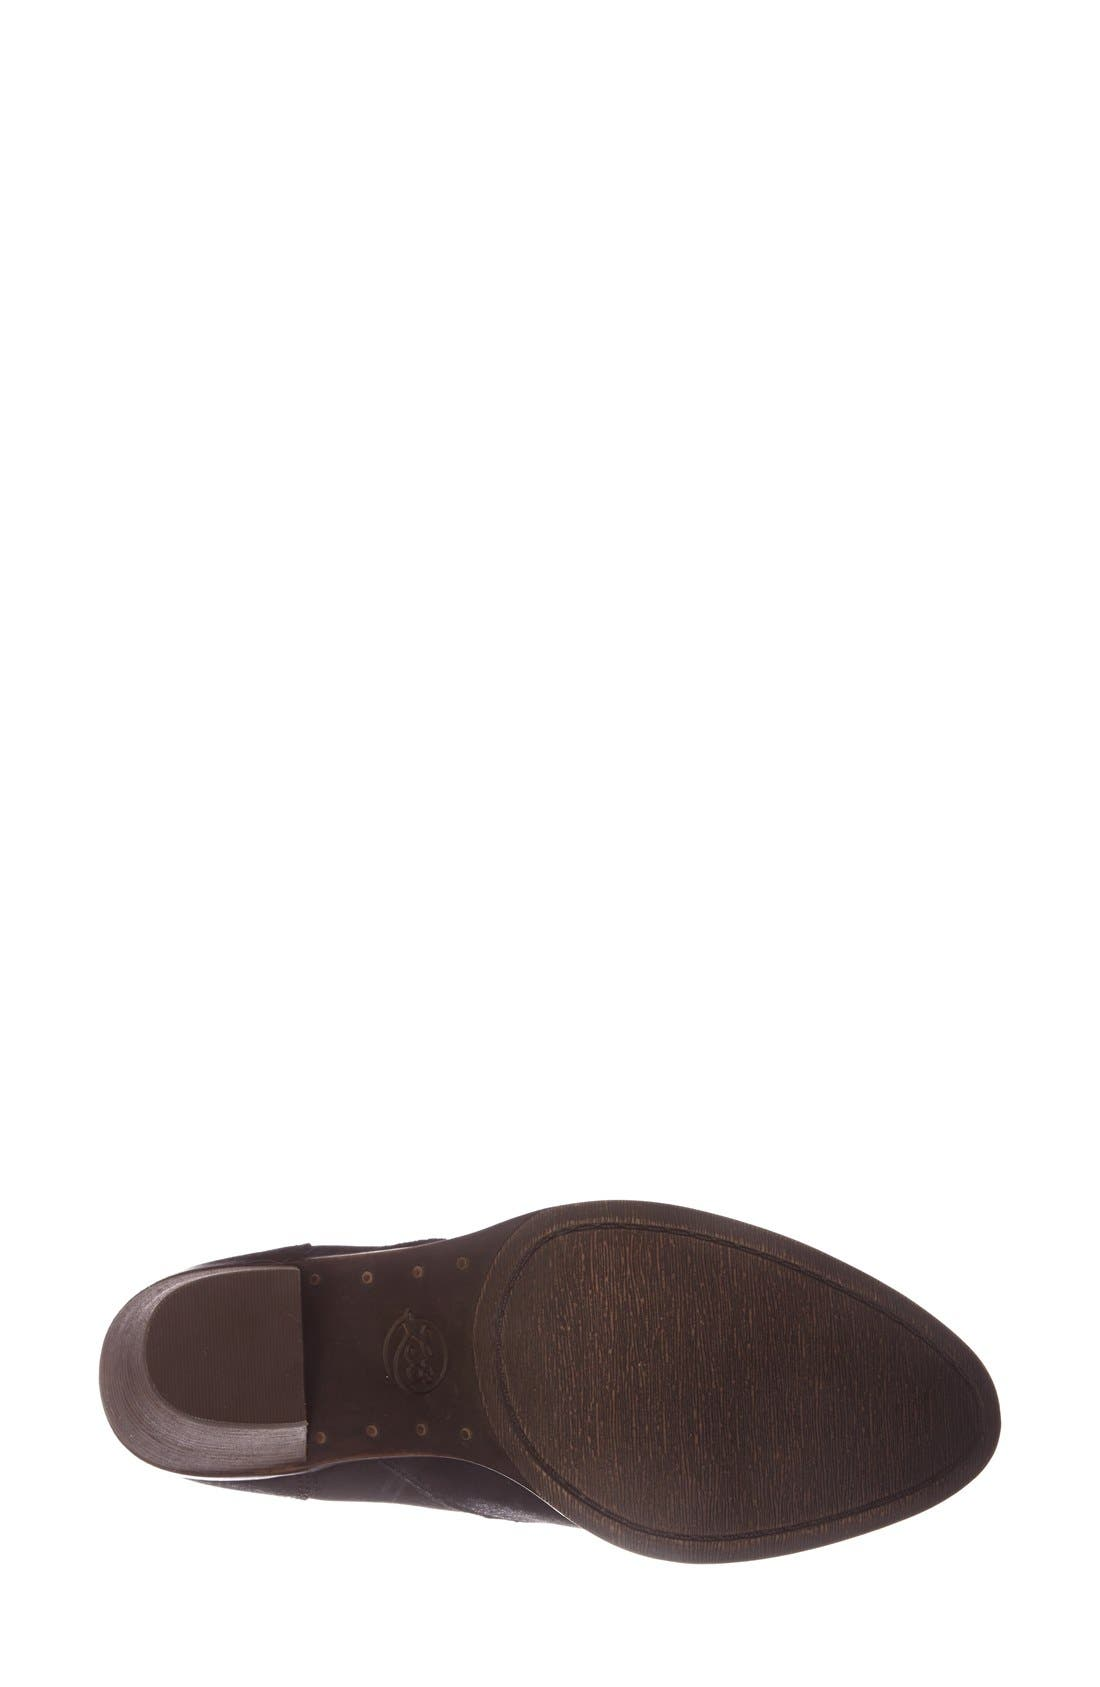 'Ehllen' Textured Leather Bootie,                             Alternate thumbnail 2, color,                             001